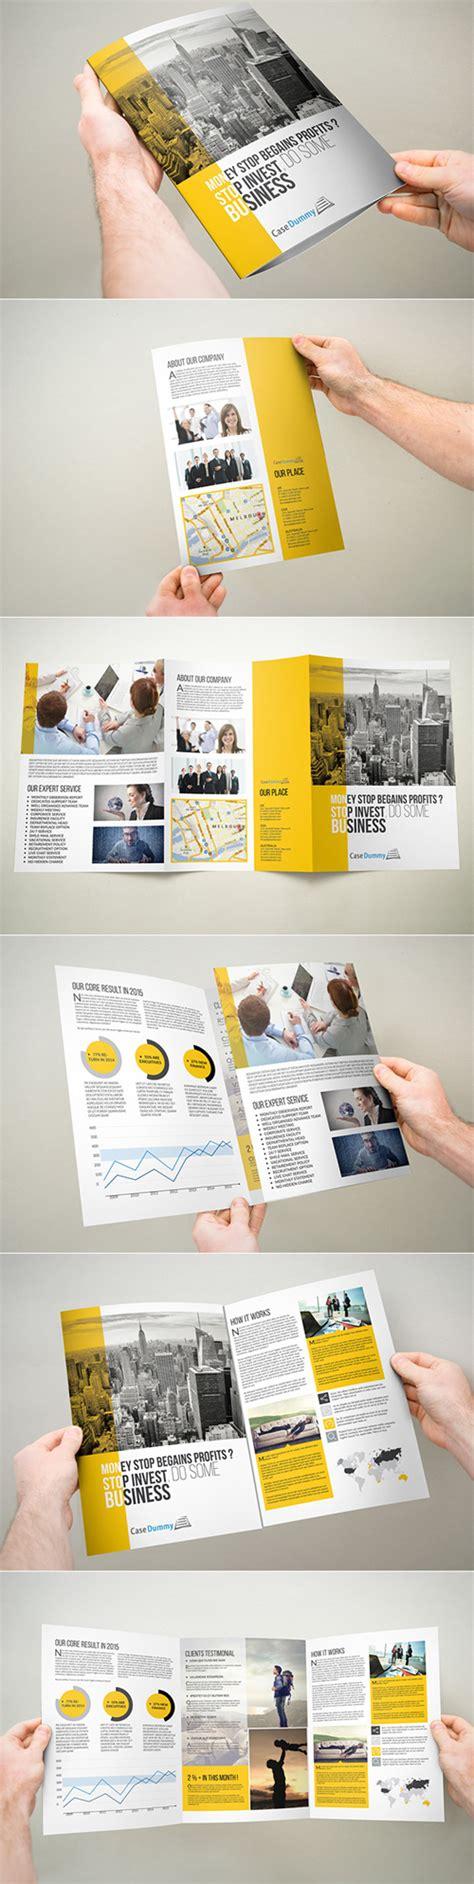 a4 brochure layout design new corporate business brochures design graphic design